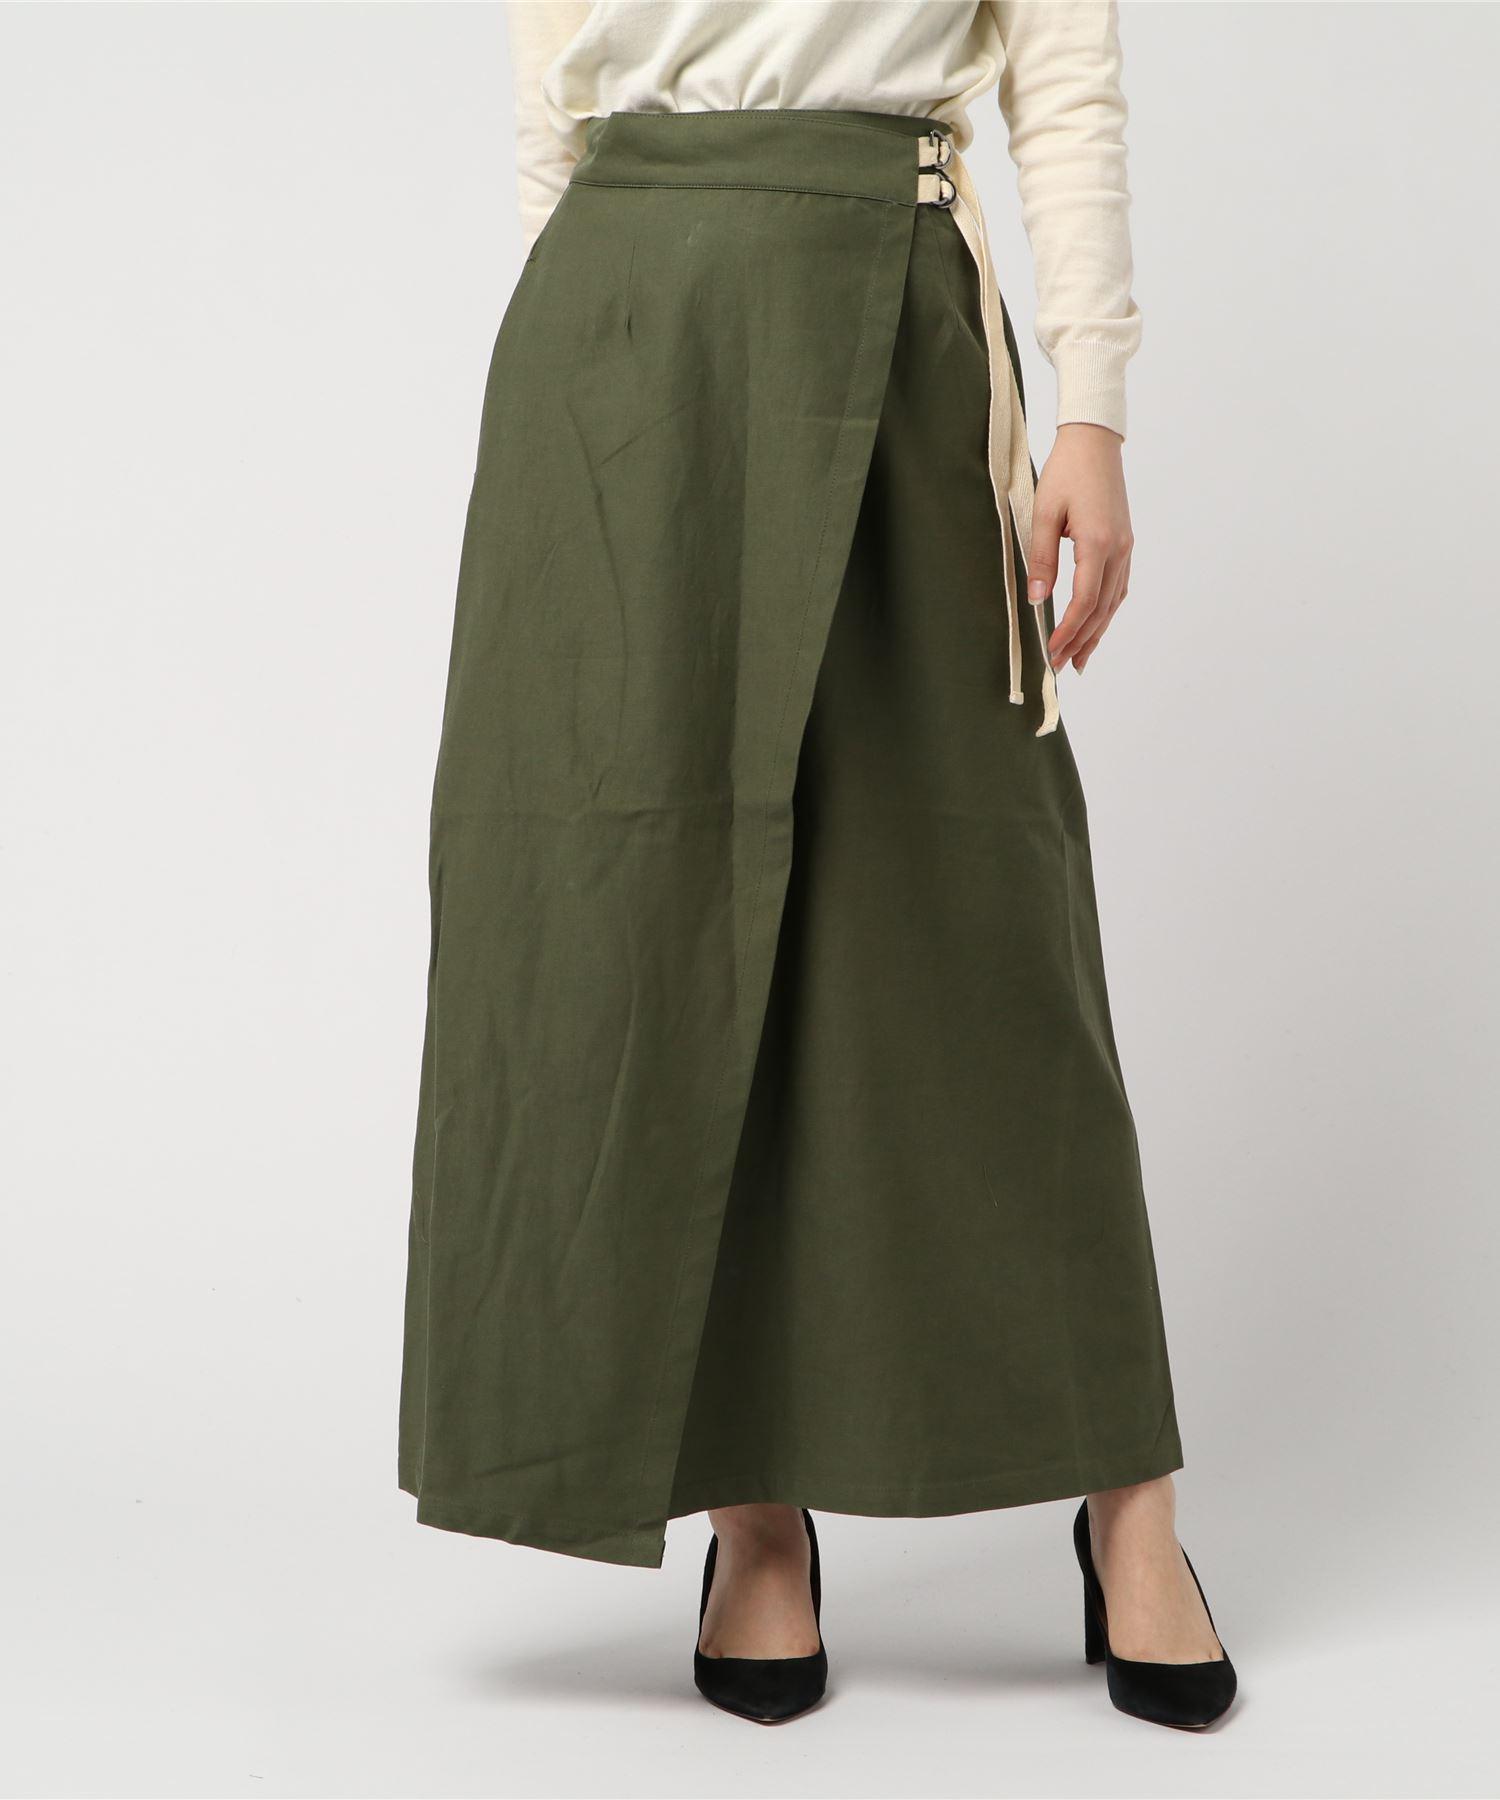 AMERICAN RAG CIE Wrap Skirt/アメリカンラグシー ラップスカート